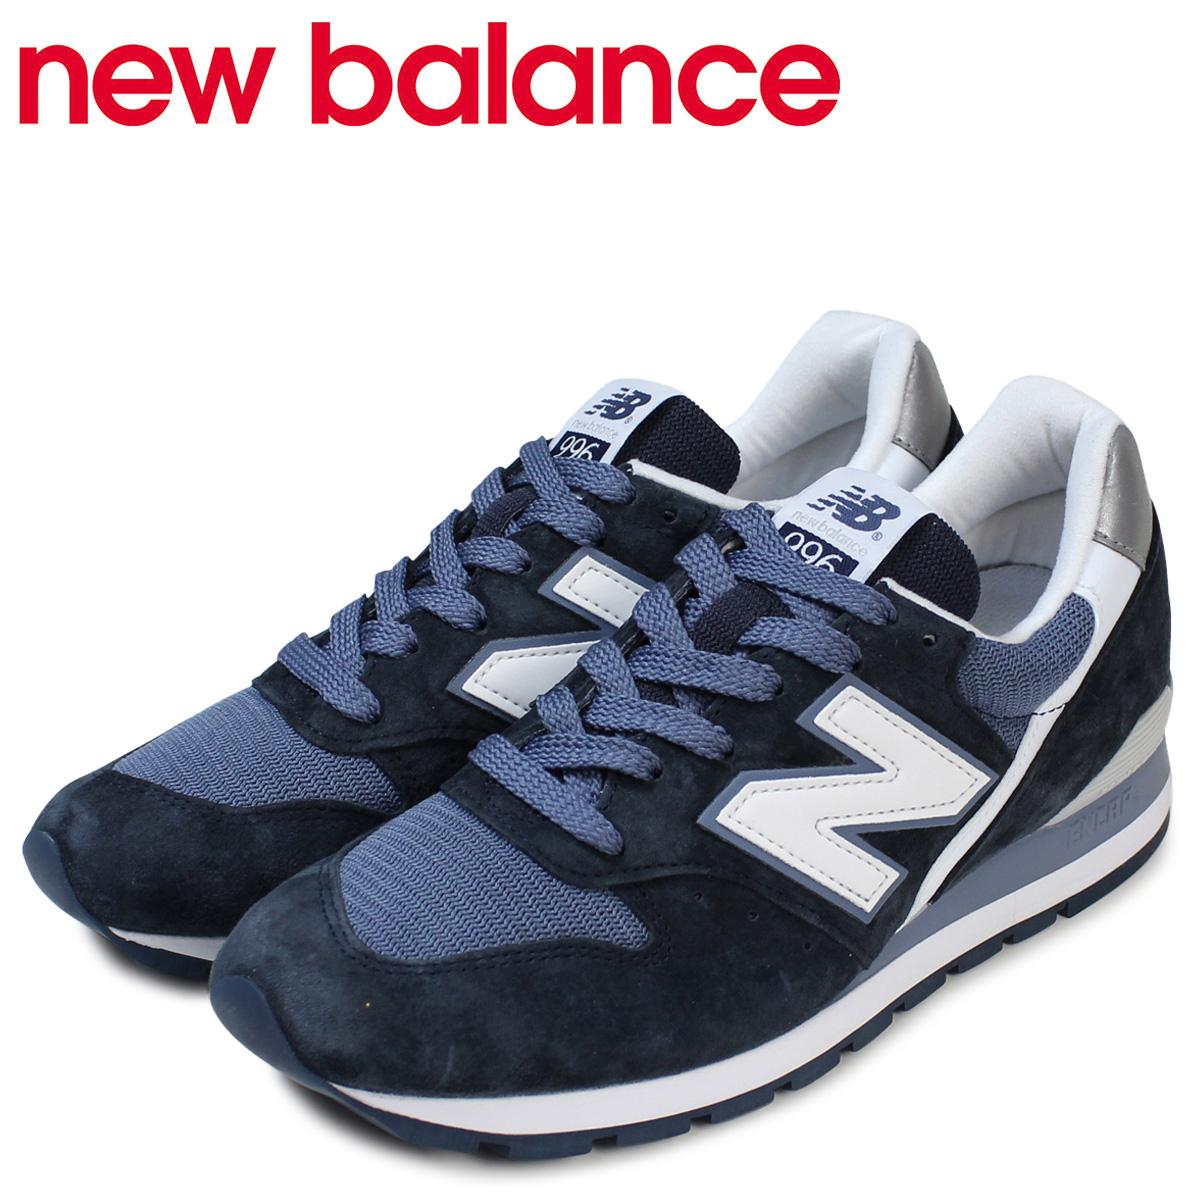 e66ae328387 Whats up Sports: new balance M996CPI 뉴발란스 996 맨즈 네이비 스니커 ...